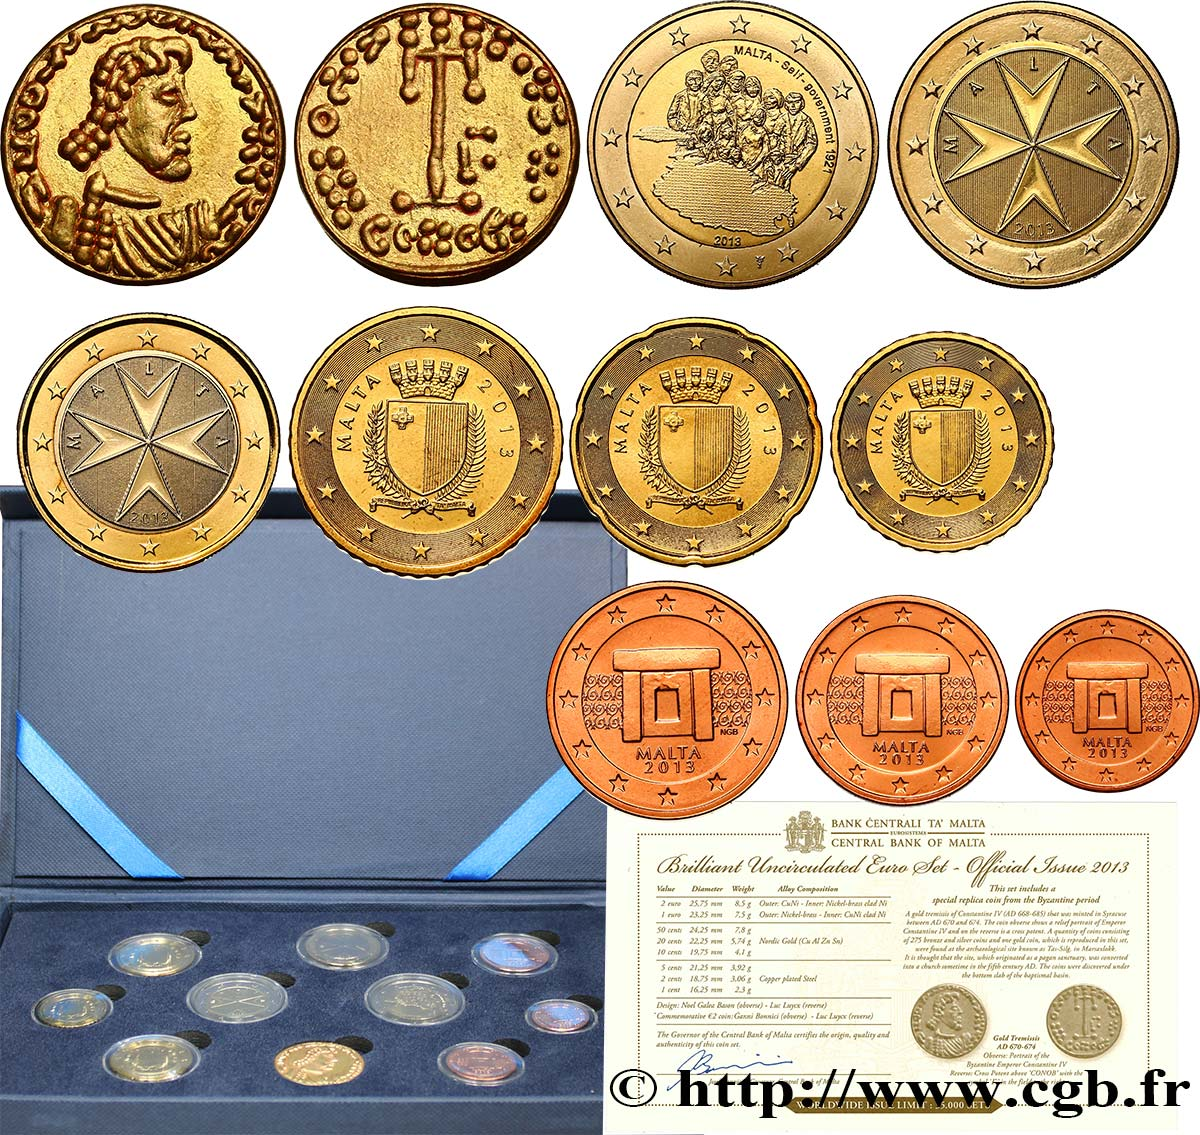 Malta Série Euro Brillant Universel 2013 Feu459600 Euro Münzen